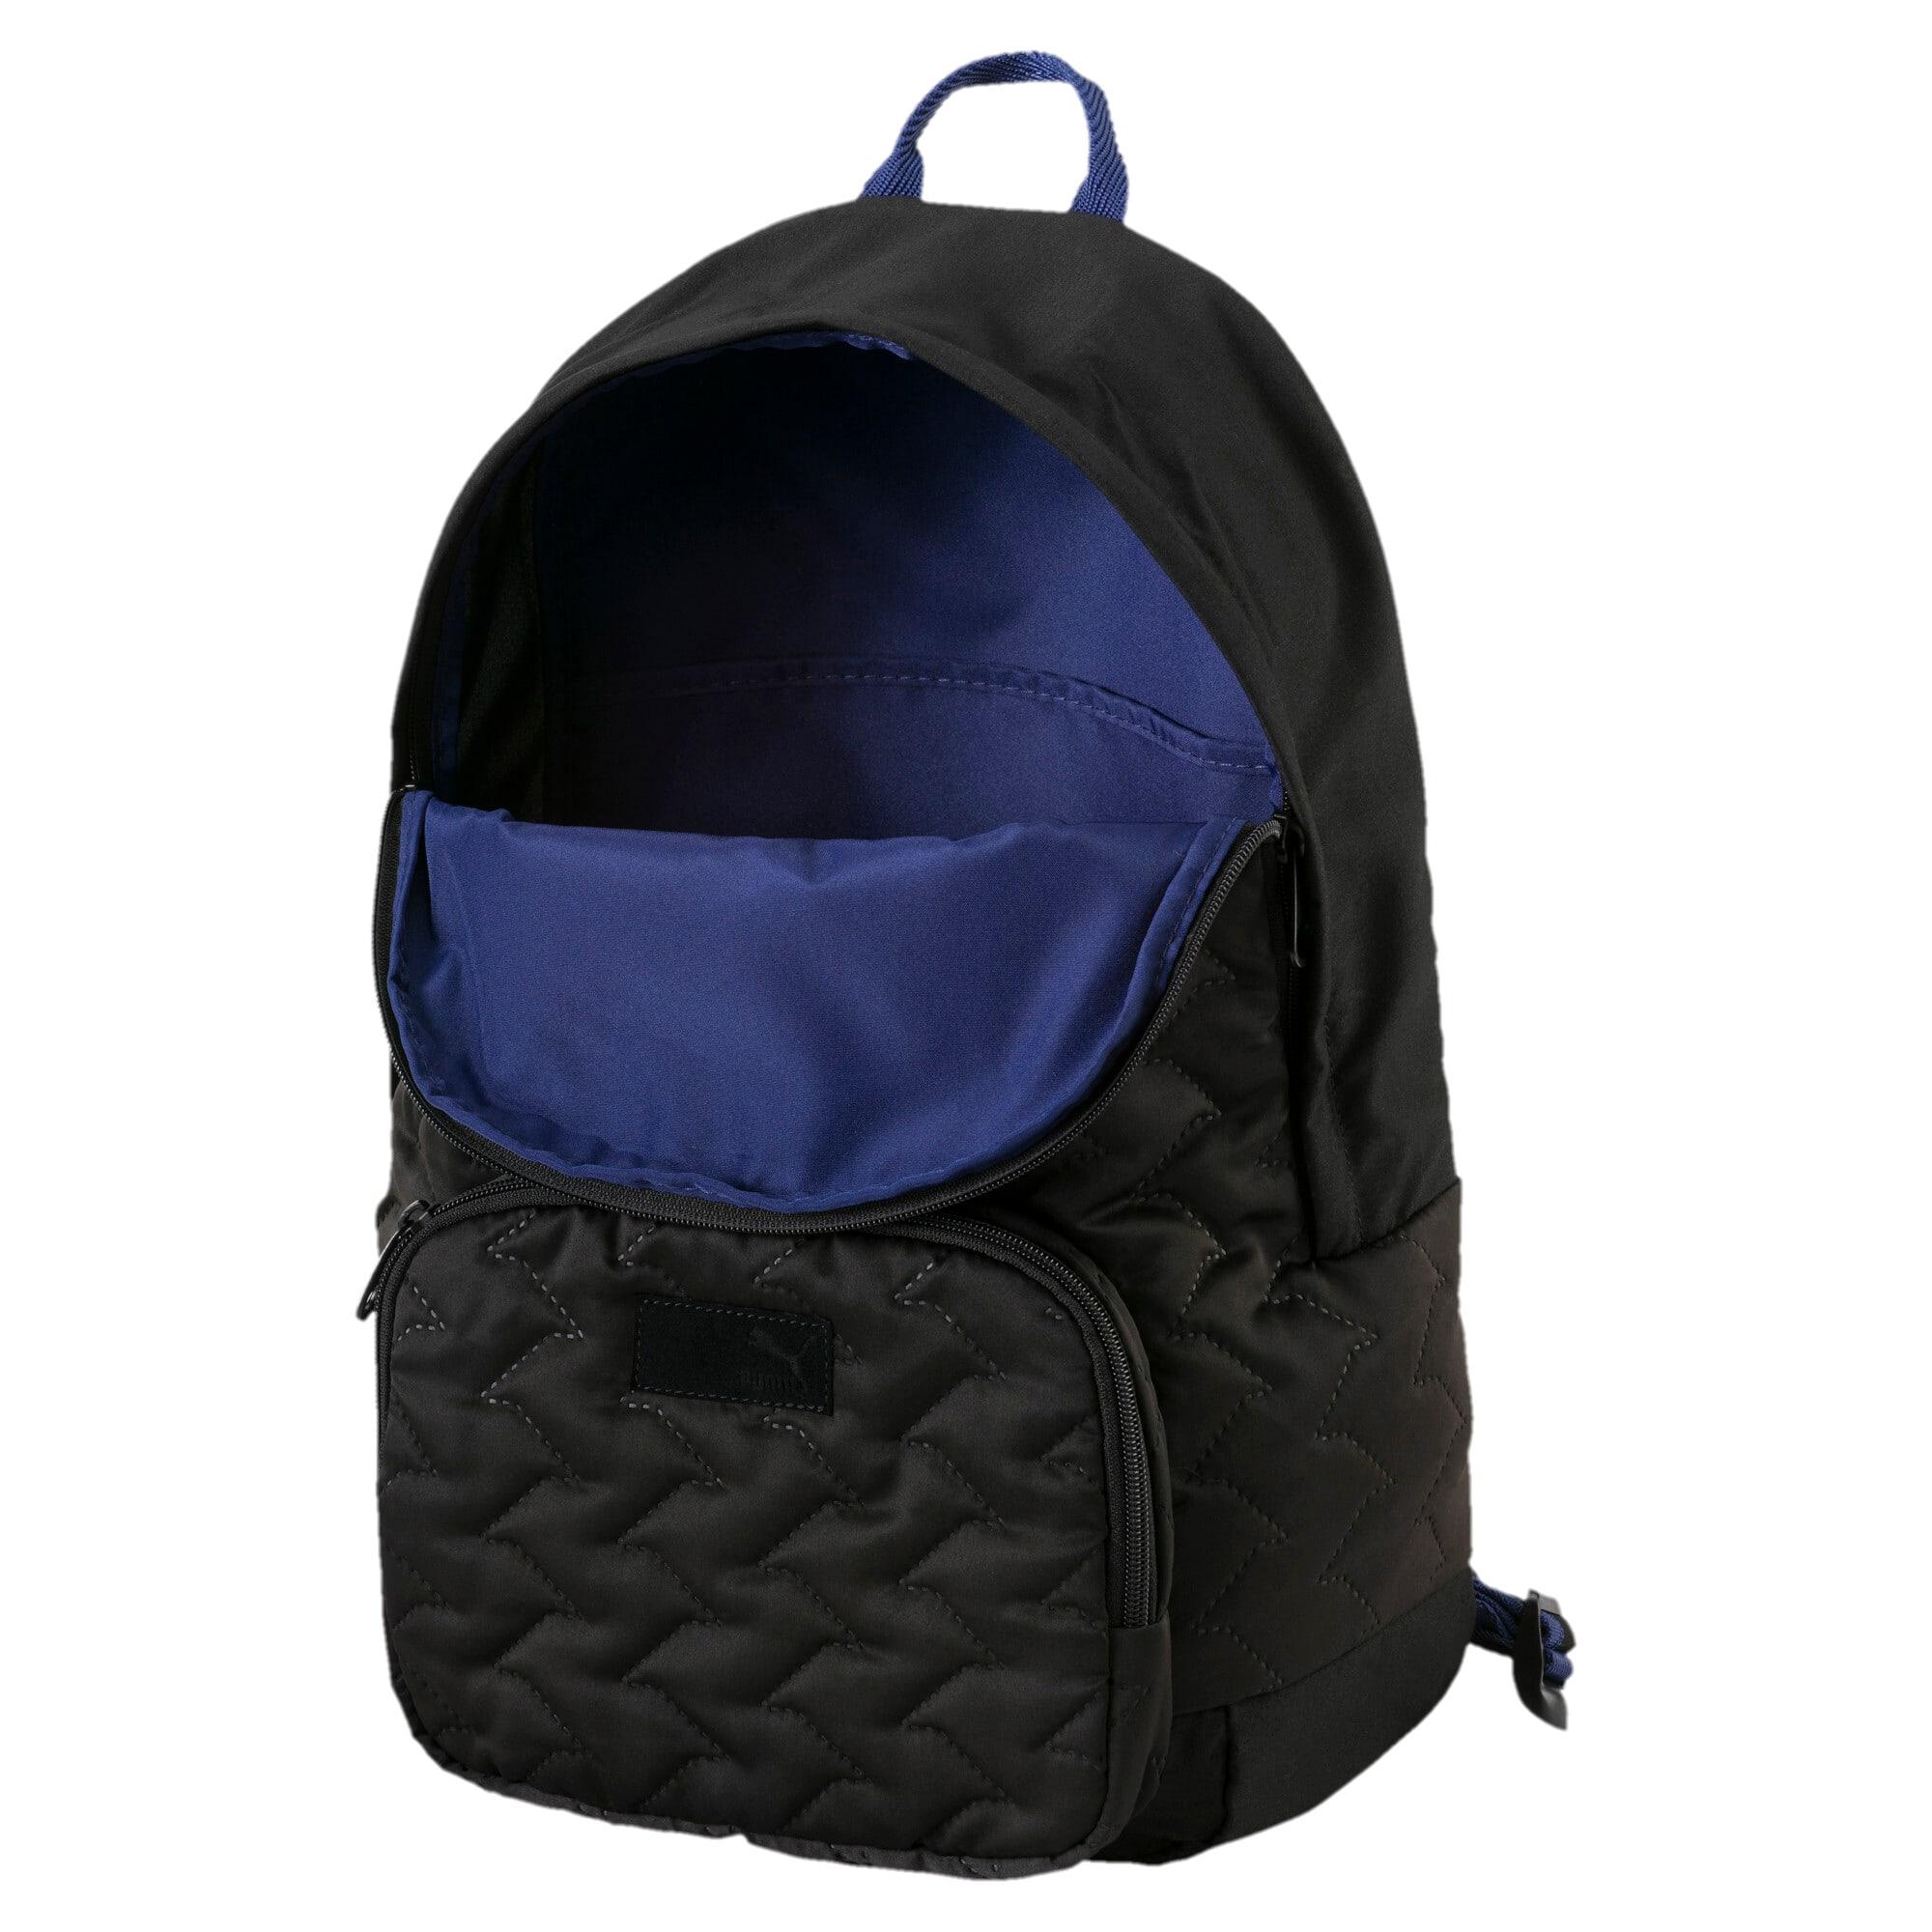 Thumbnail 3 of Women's Prime Lux Backpack, Puma Black-Blue Depths, medium-IND